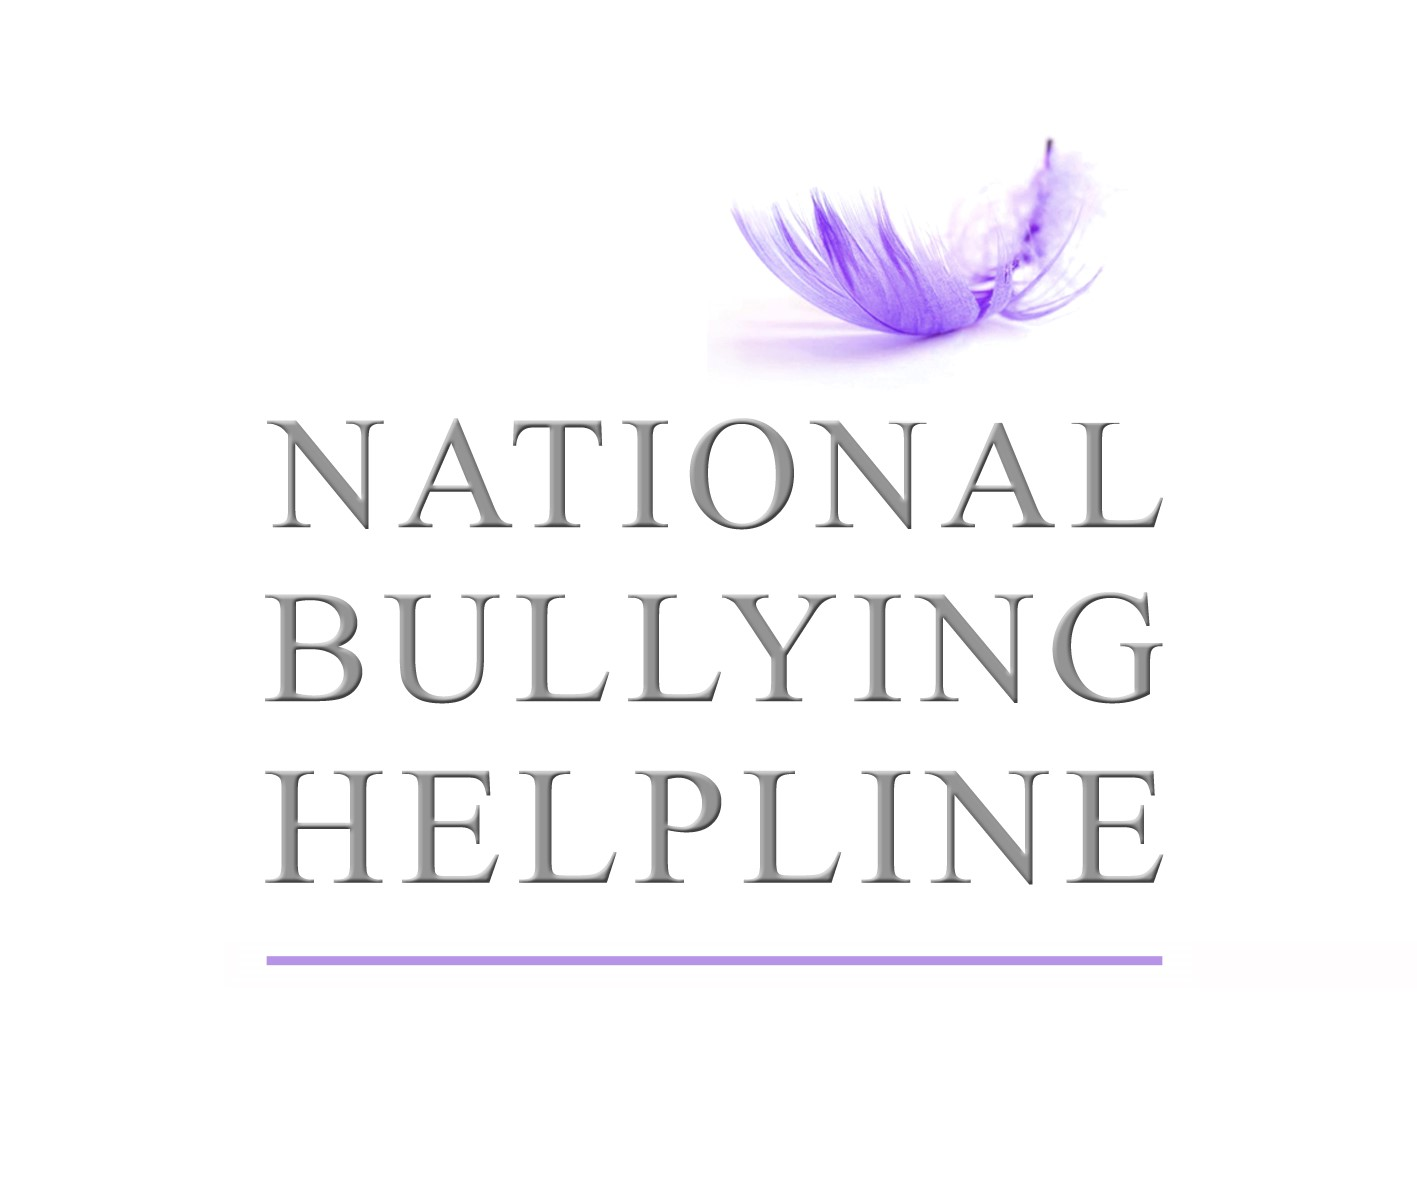 Main photo for National Bullying Helpline